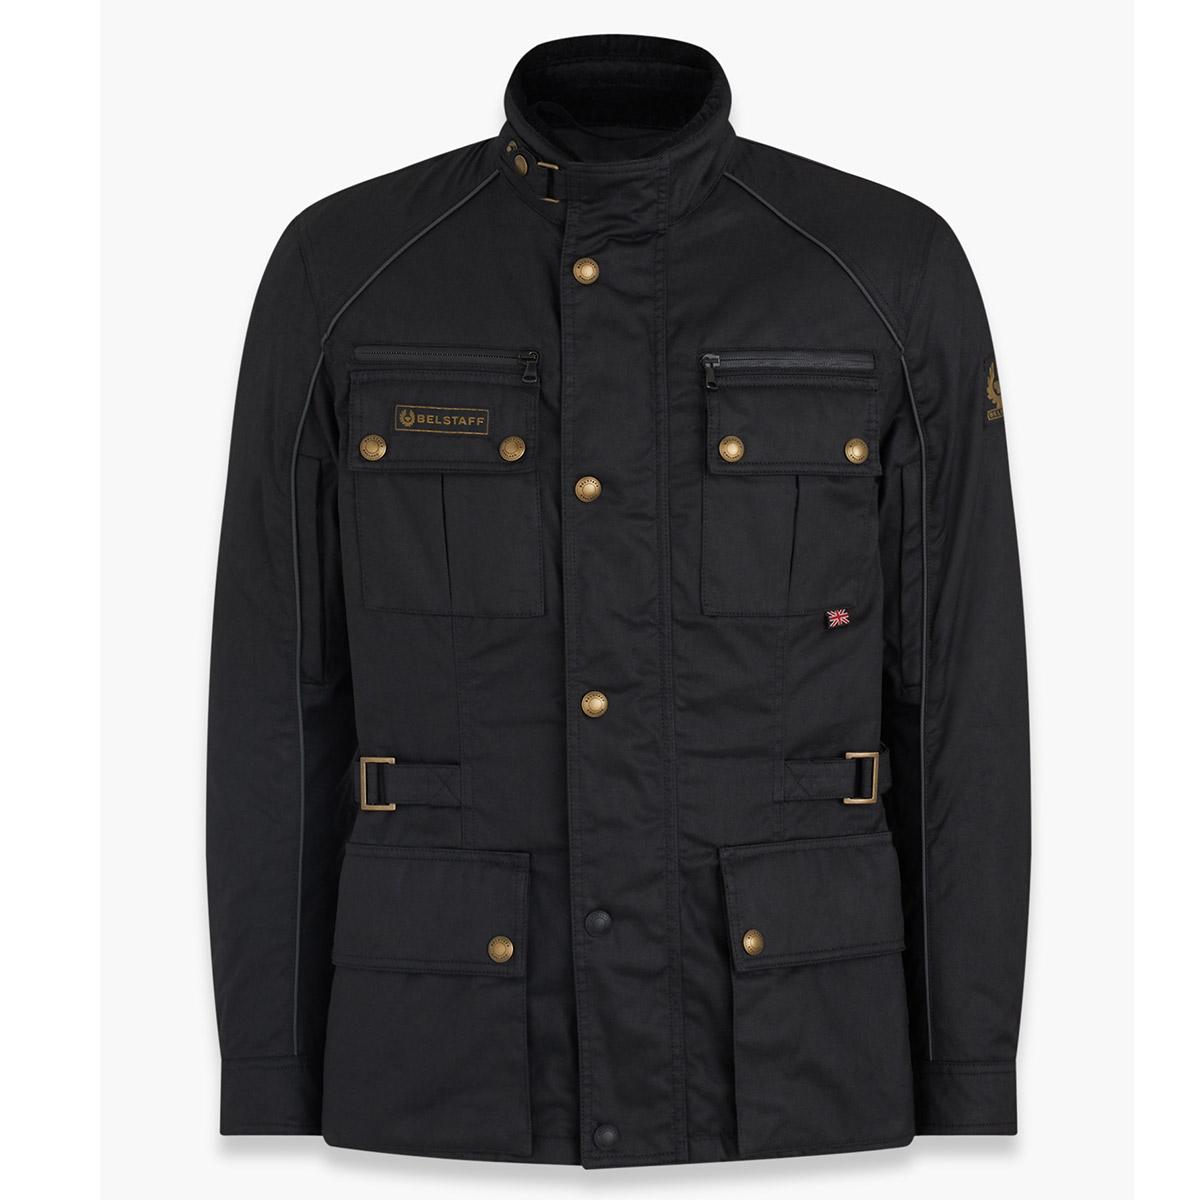 Belstaff Tourmaster Pro 2.0 Waxed Cotton Jacket